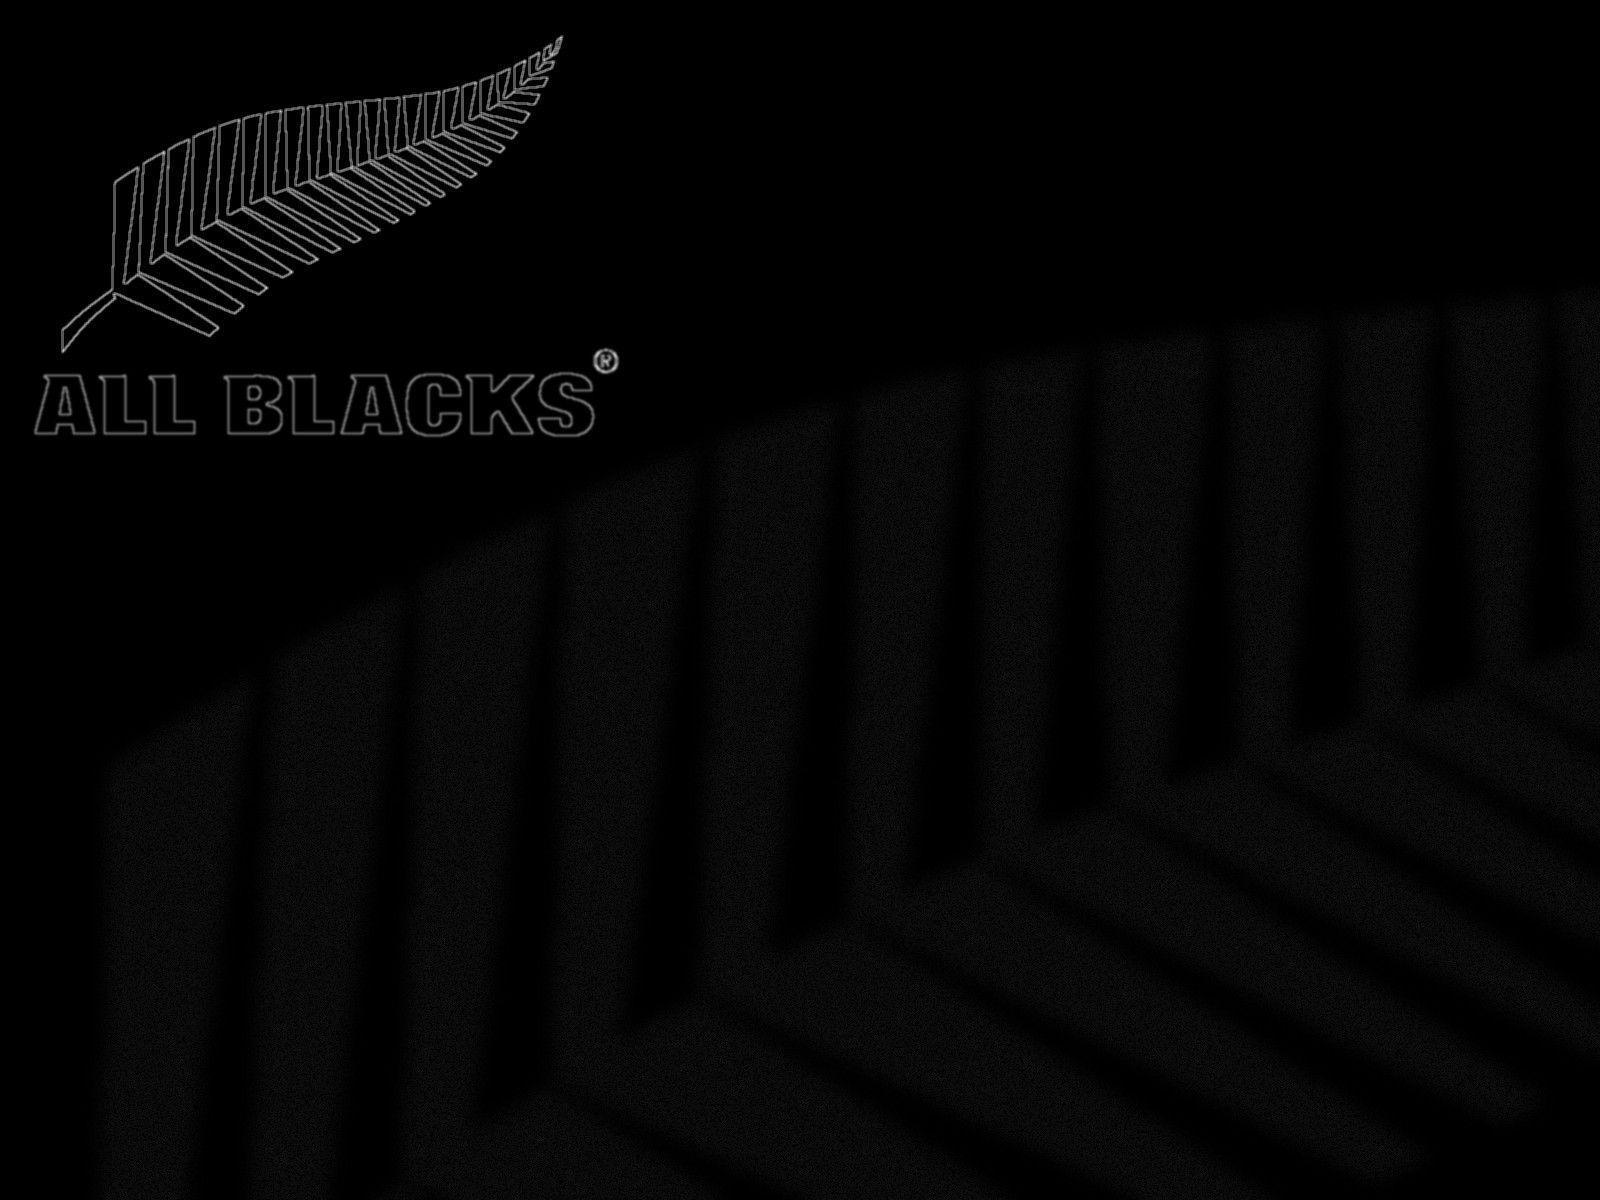 New Zealand All Blacks Wallpapers - Wallpaper Cave